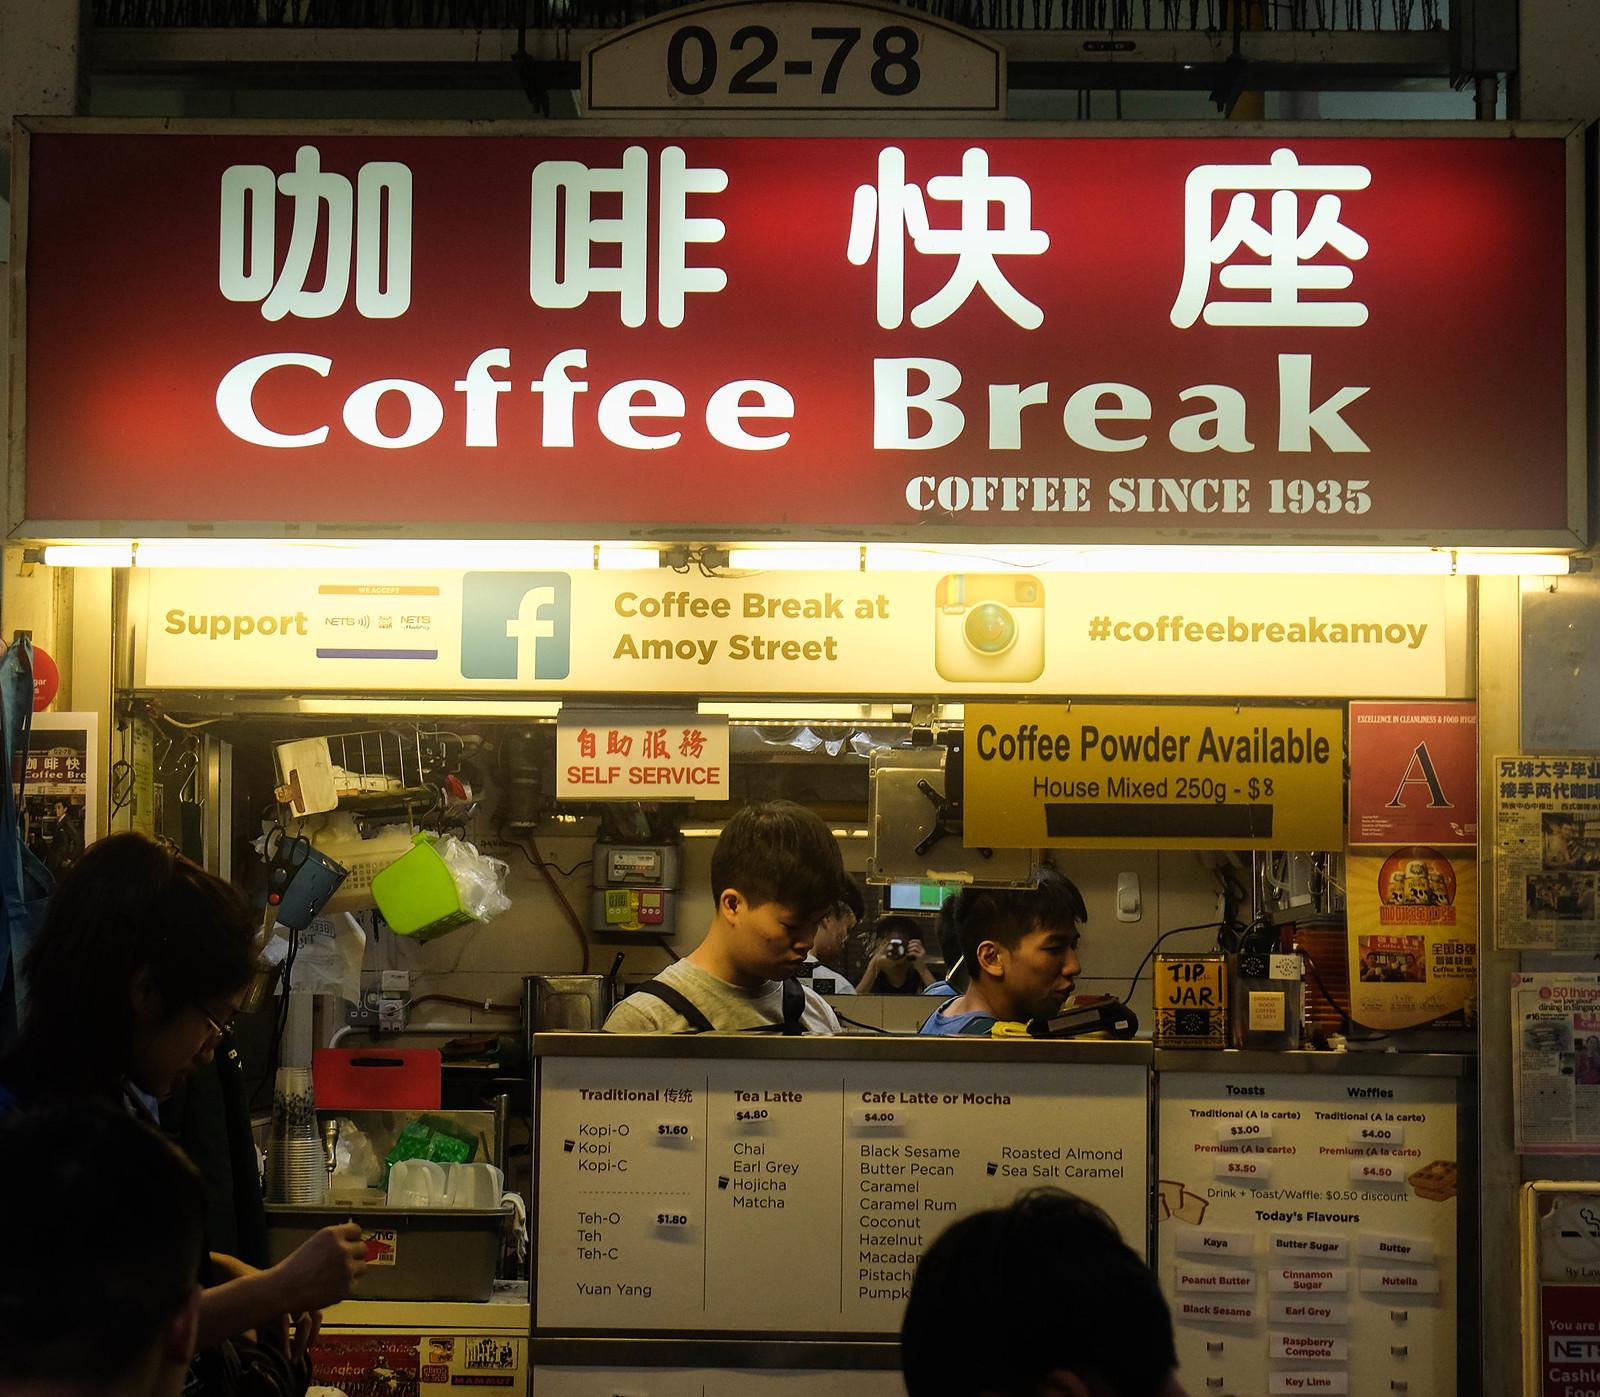 amoy street food centre Coffee Break storefront